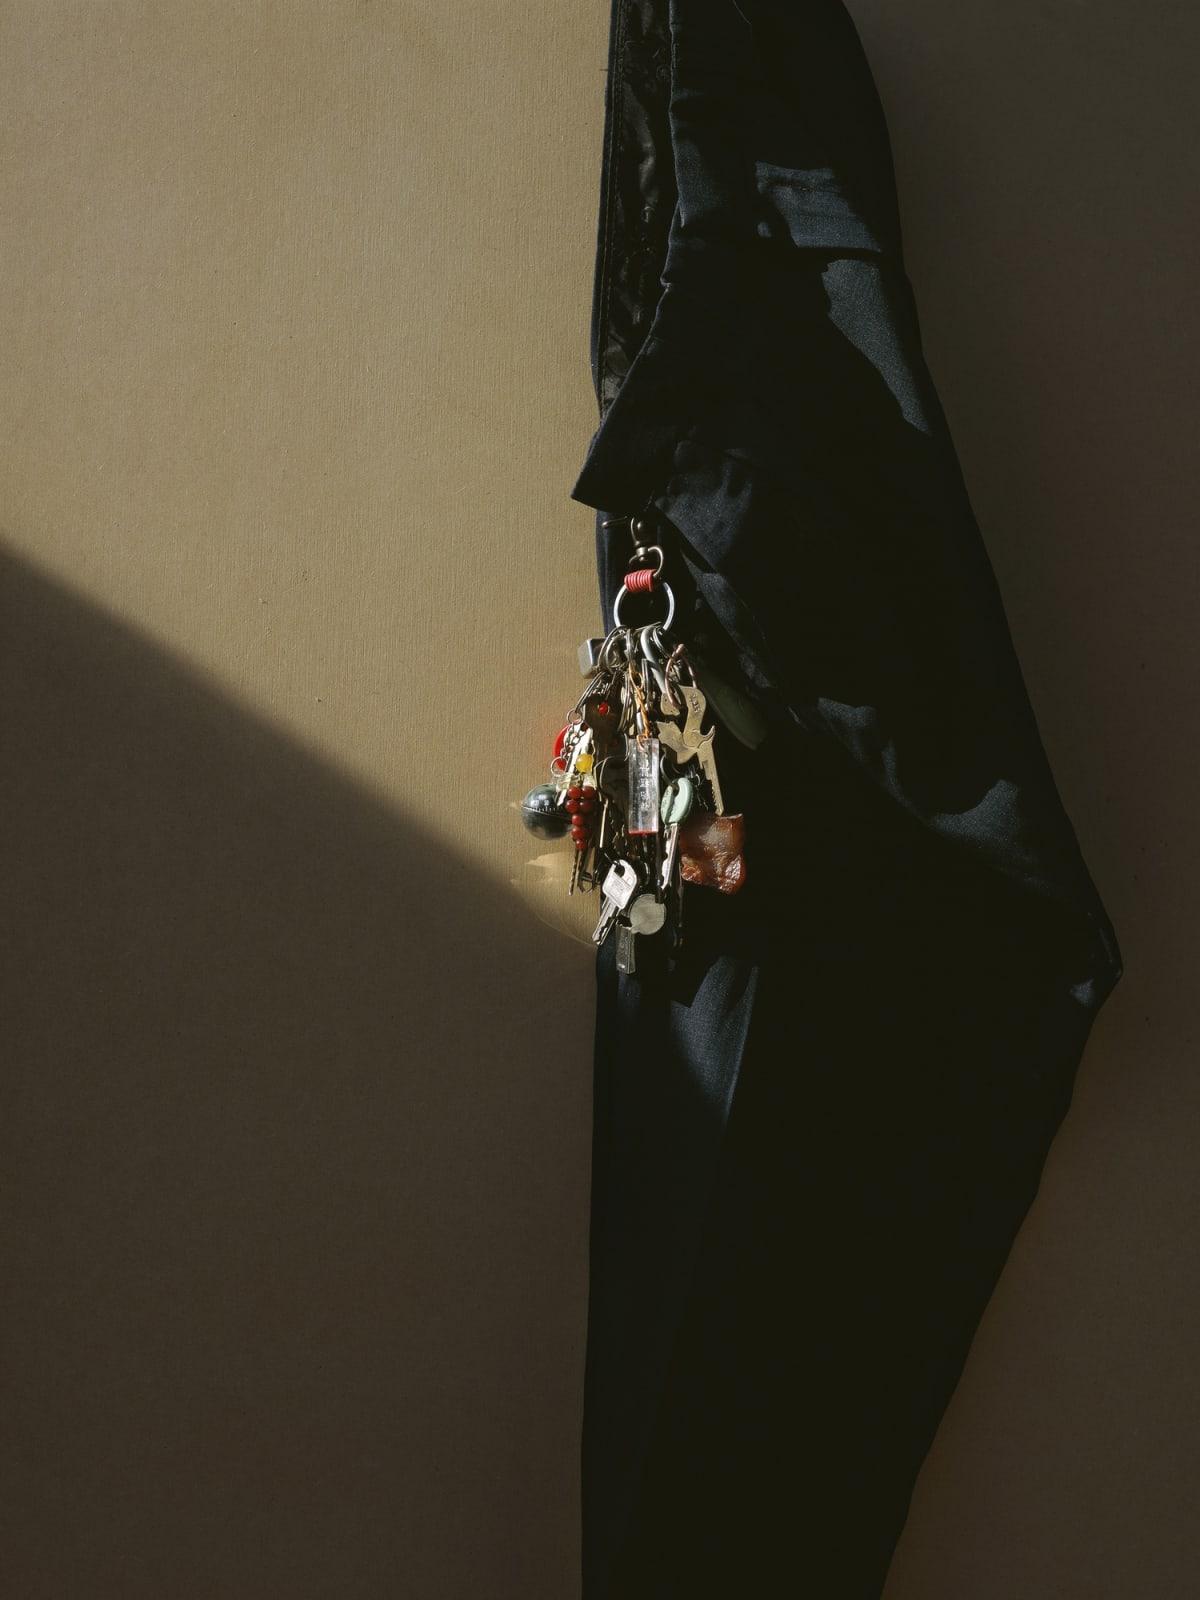 Chen Wei,The Bunch of Keys, 2011